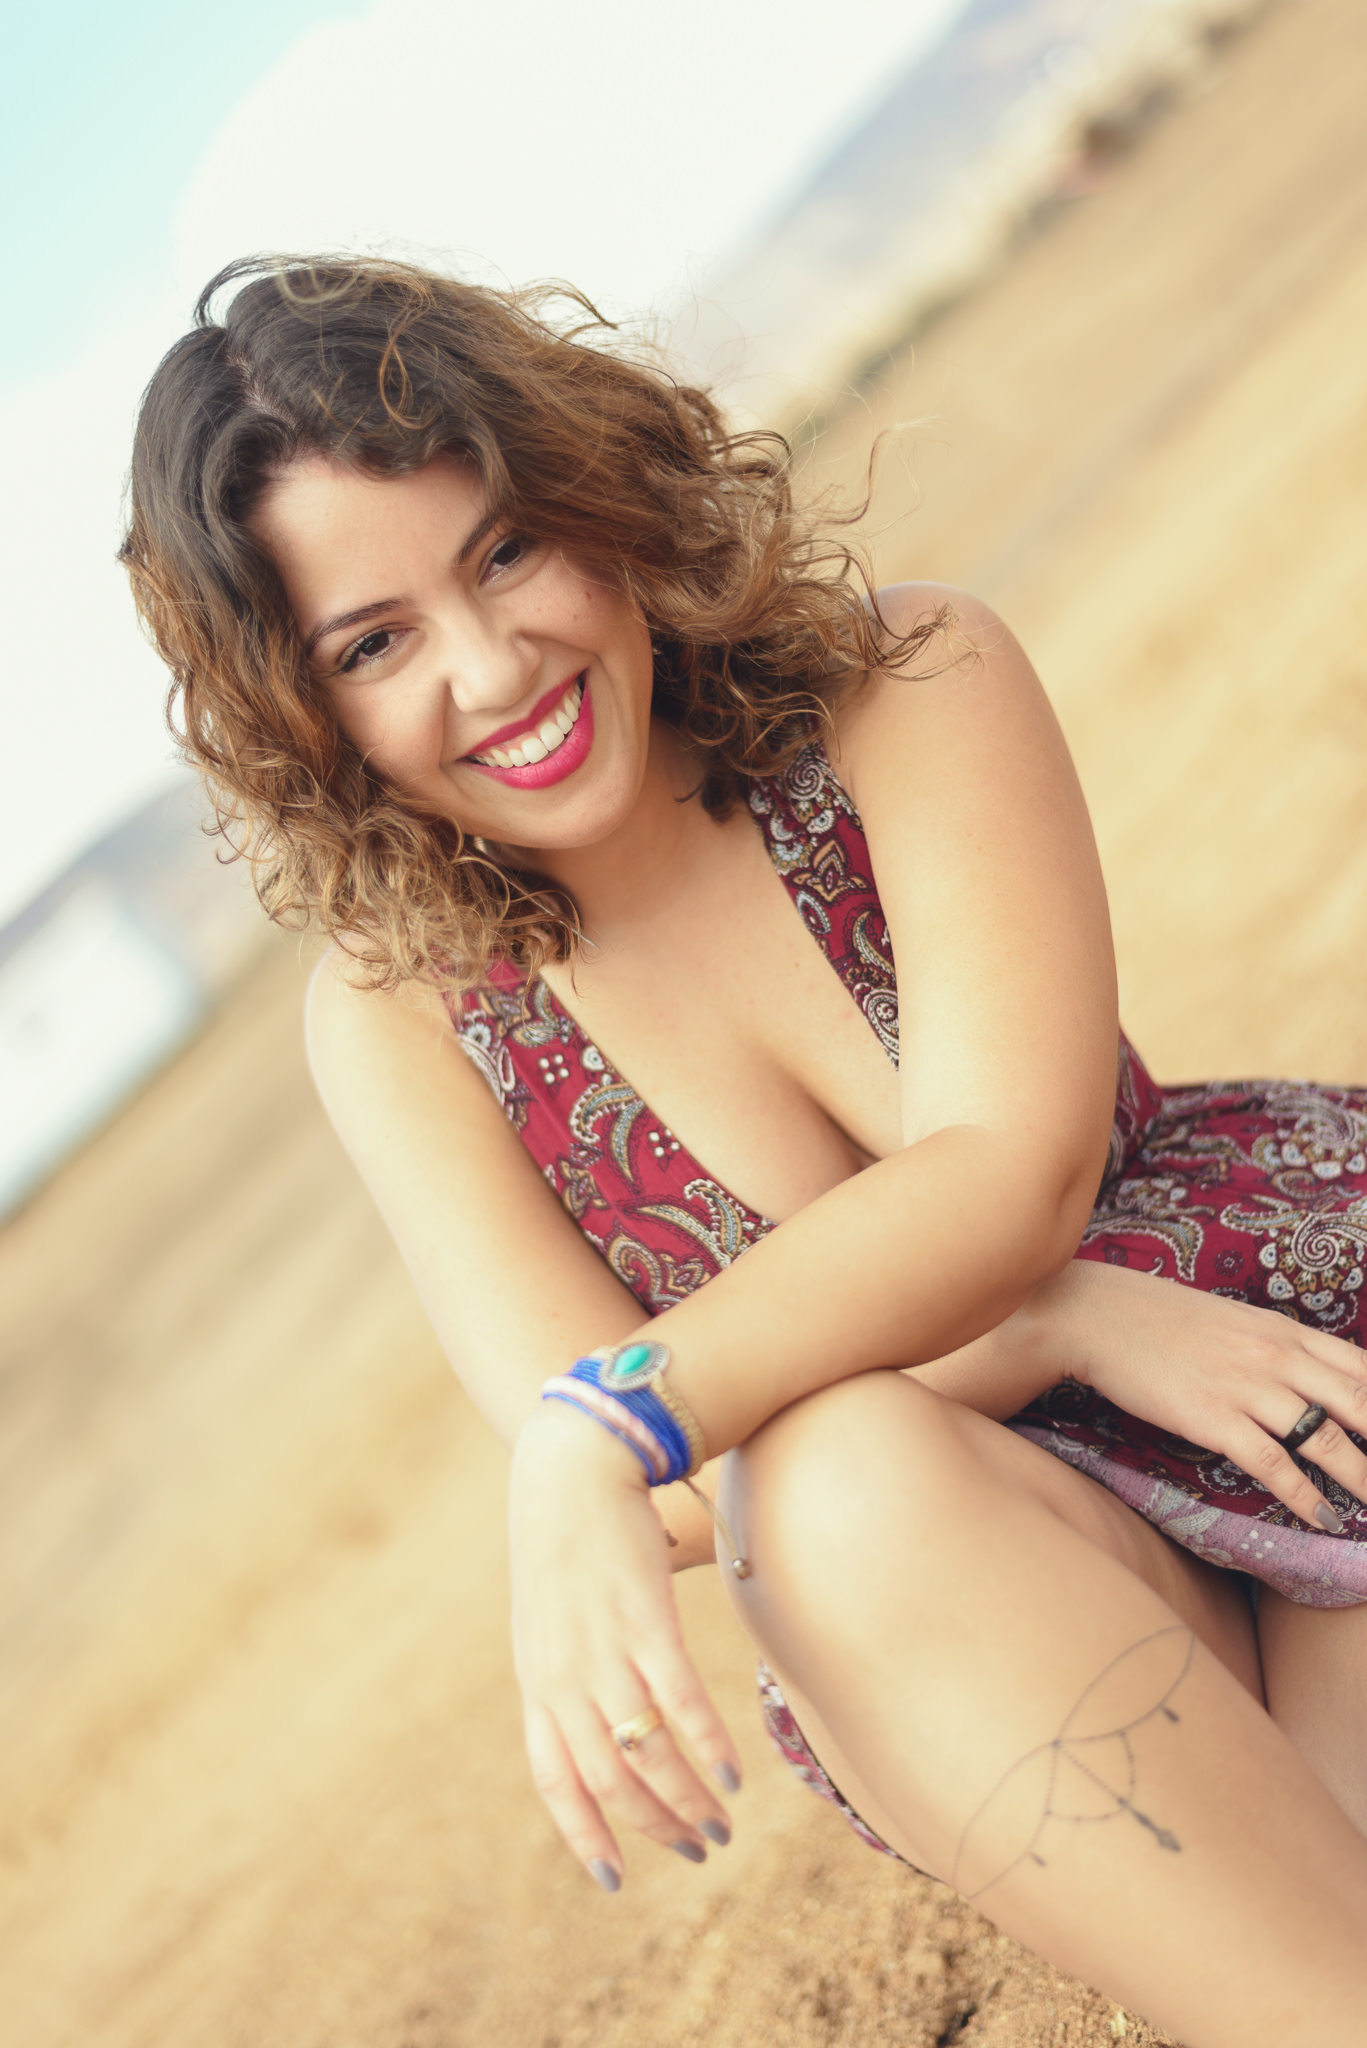 melissa-alcantar-fotografia-mexicali-workshop-be-here-project-juliana-sit-smile